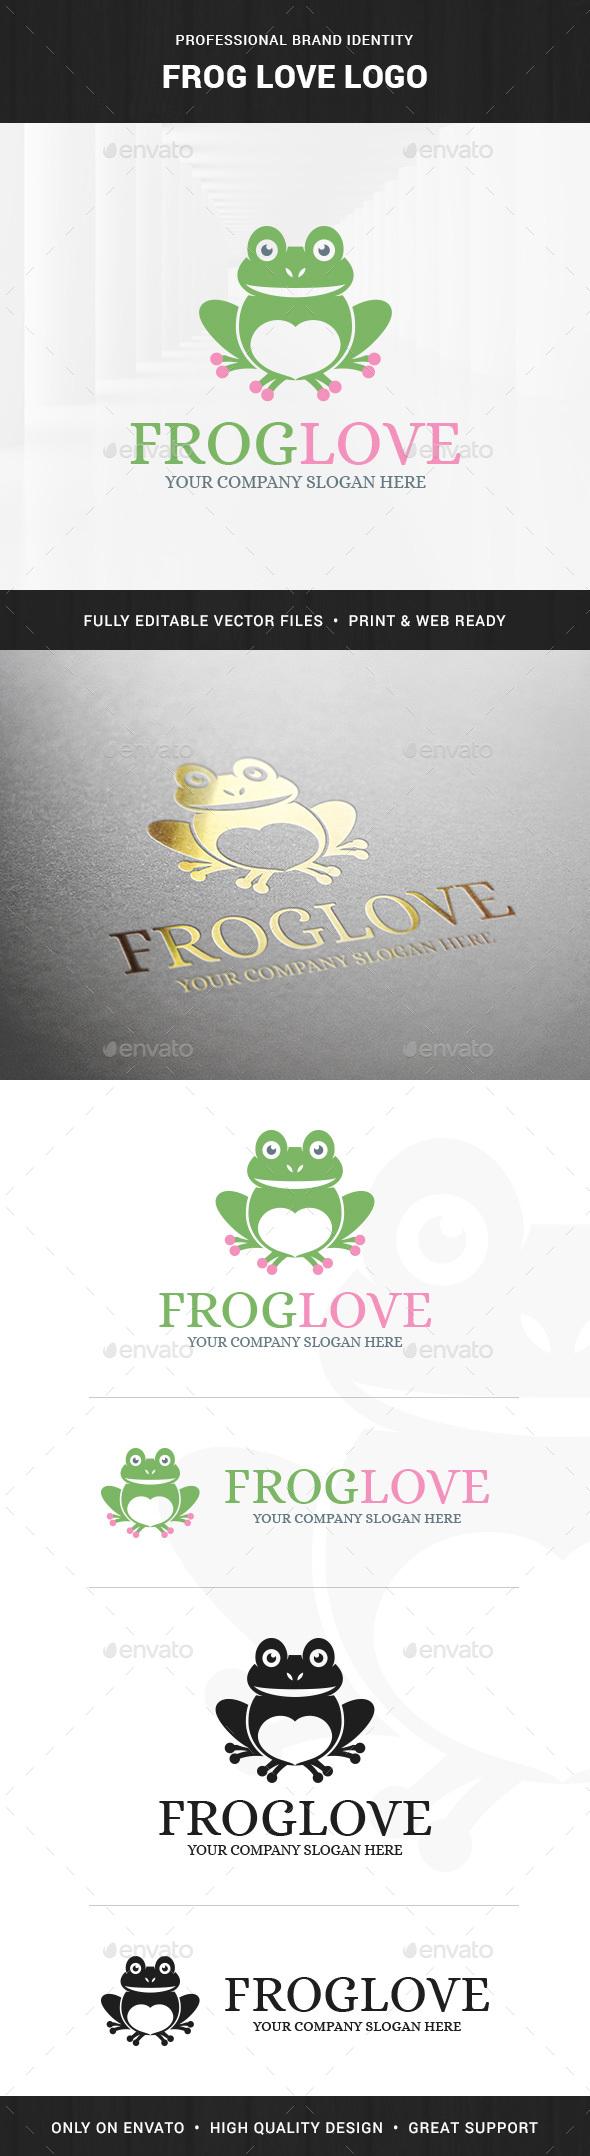 Frog Love Logo Template